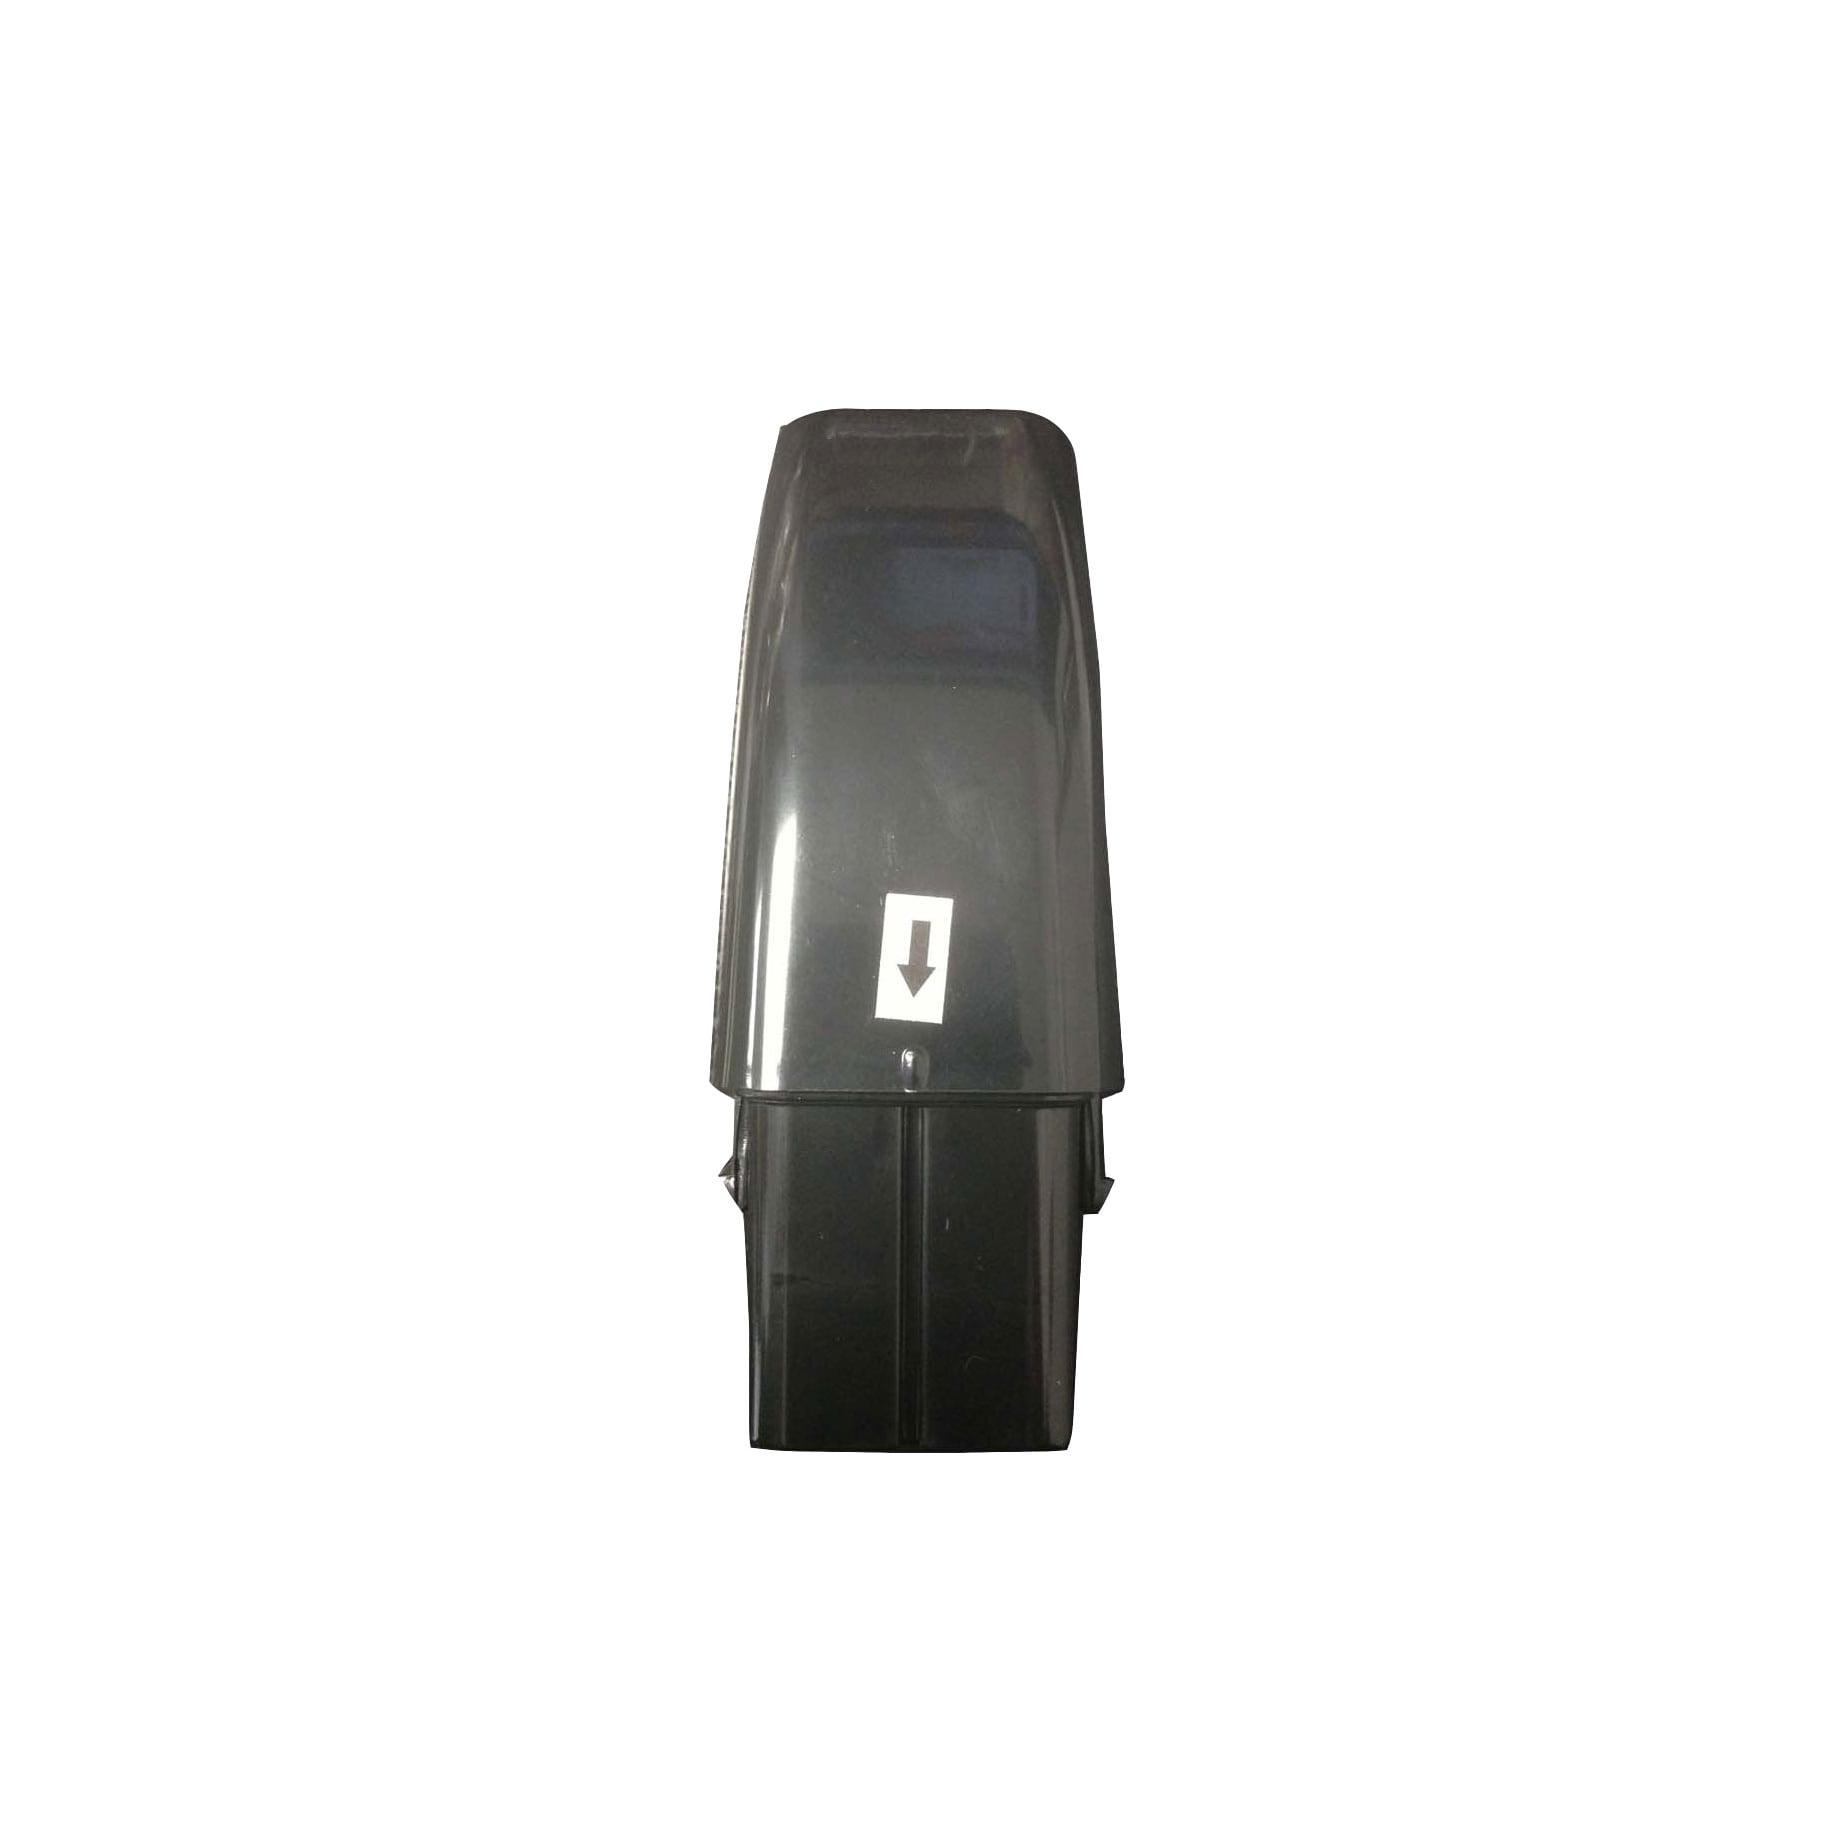 Crucial High Capacity Black Vacuum Battery Fits Ontel Swi...